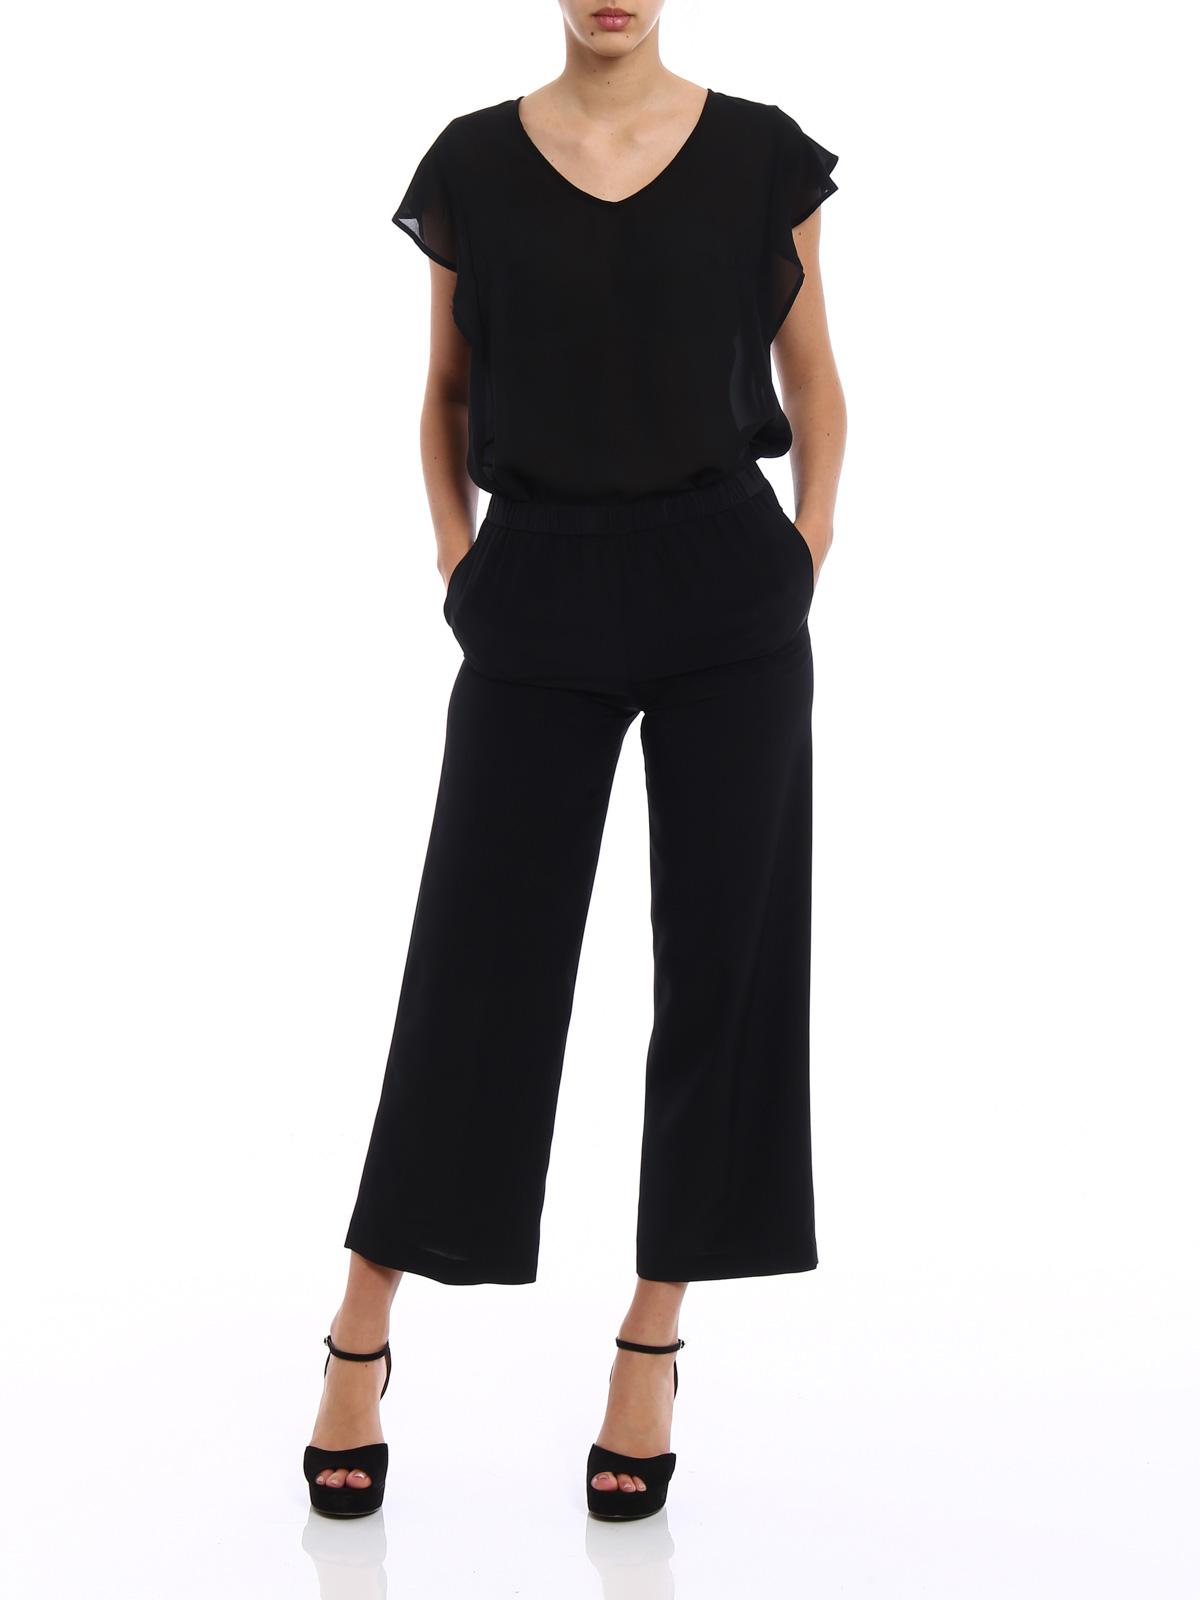 Immagine di ASPESI | Pantaloni Donna in Seta